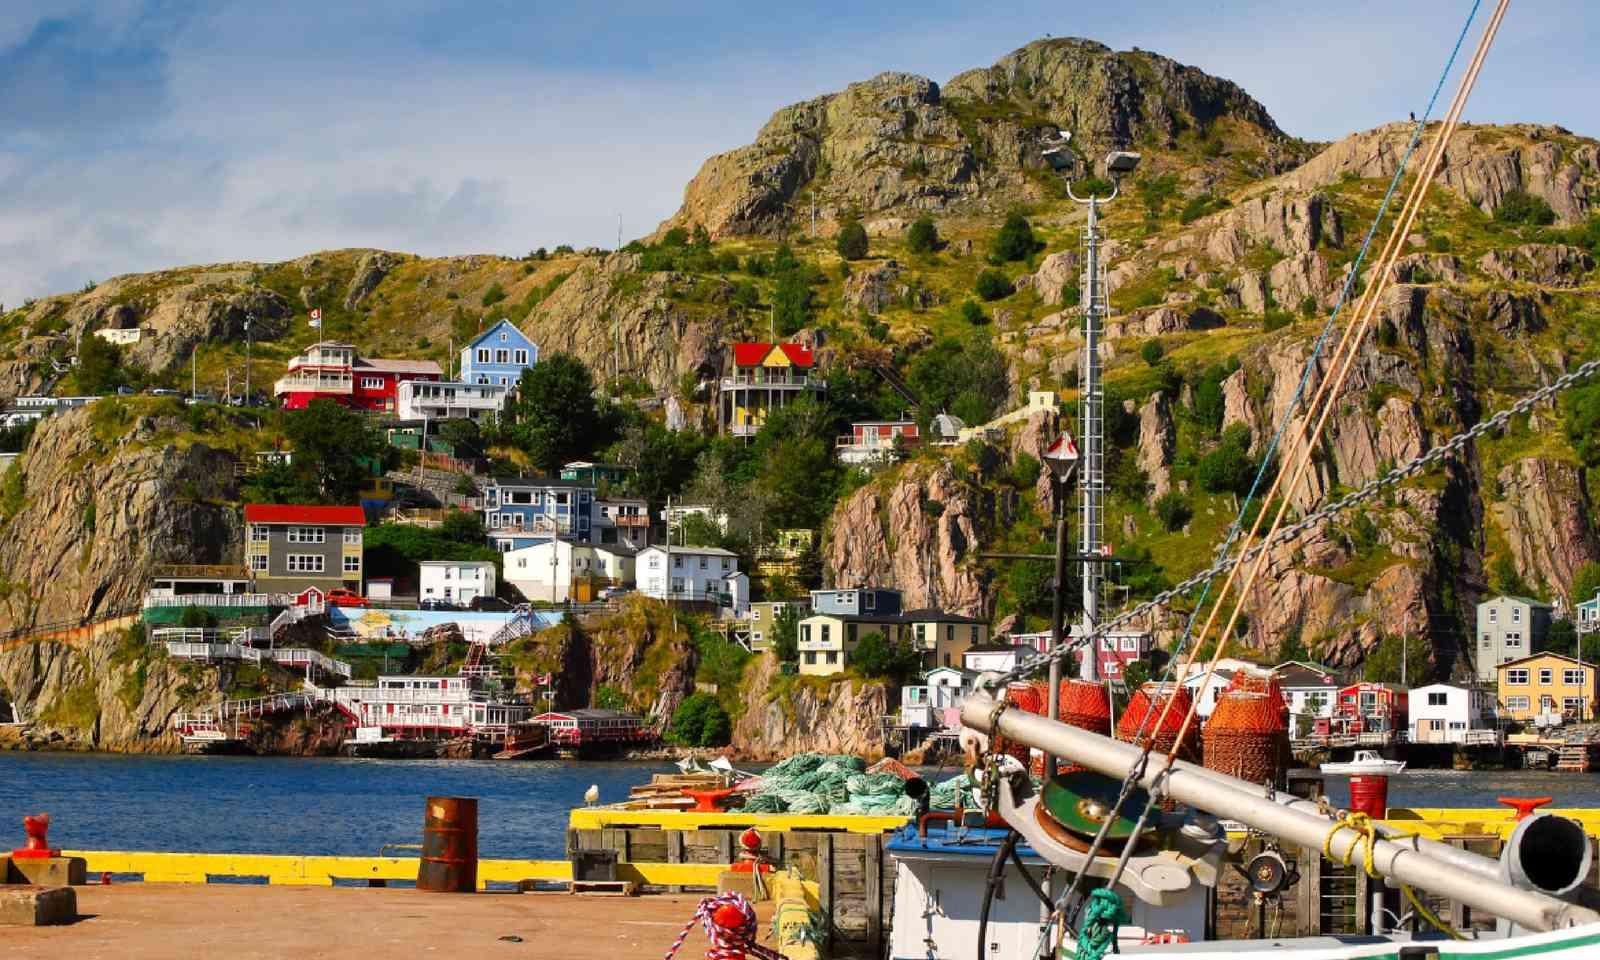 St.John's, Newfoundland (Shutterstock)